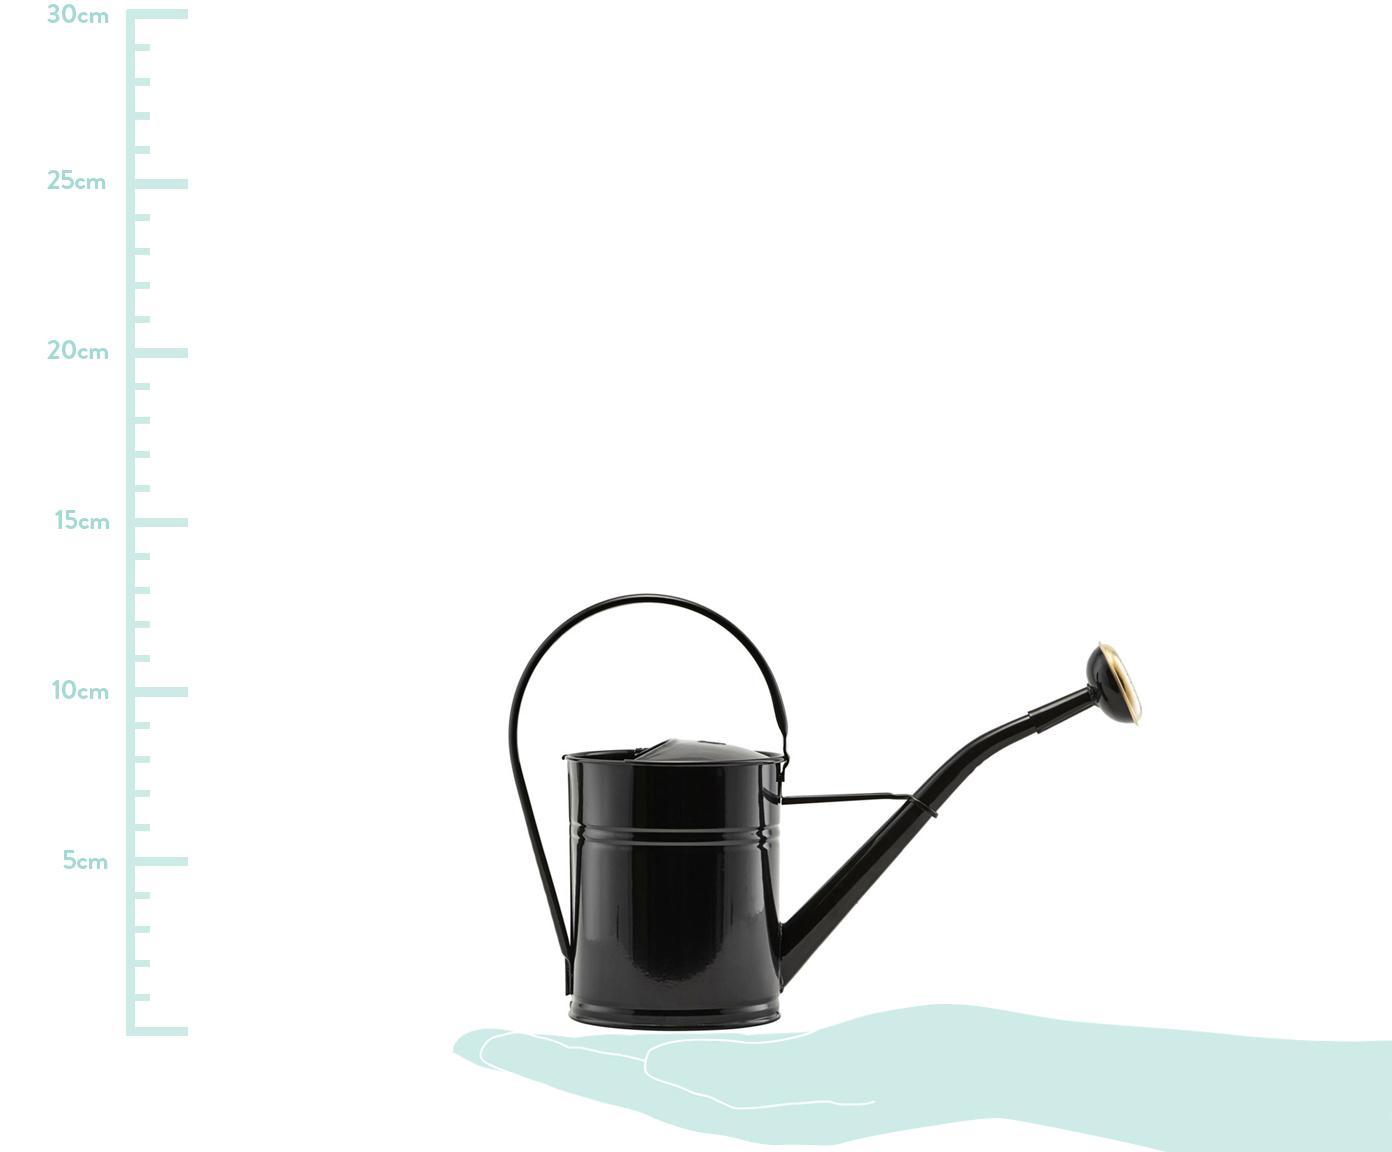 Gießkanne Granny, Metall, lackiert, Schwarz, Messingfarben, 13 x 25 cm